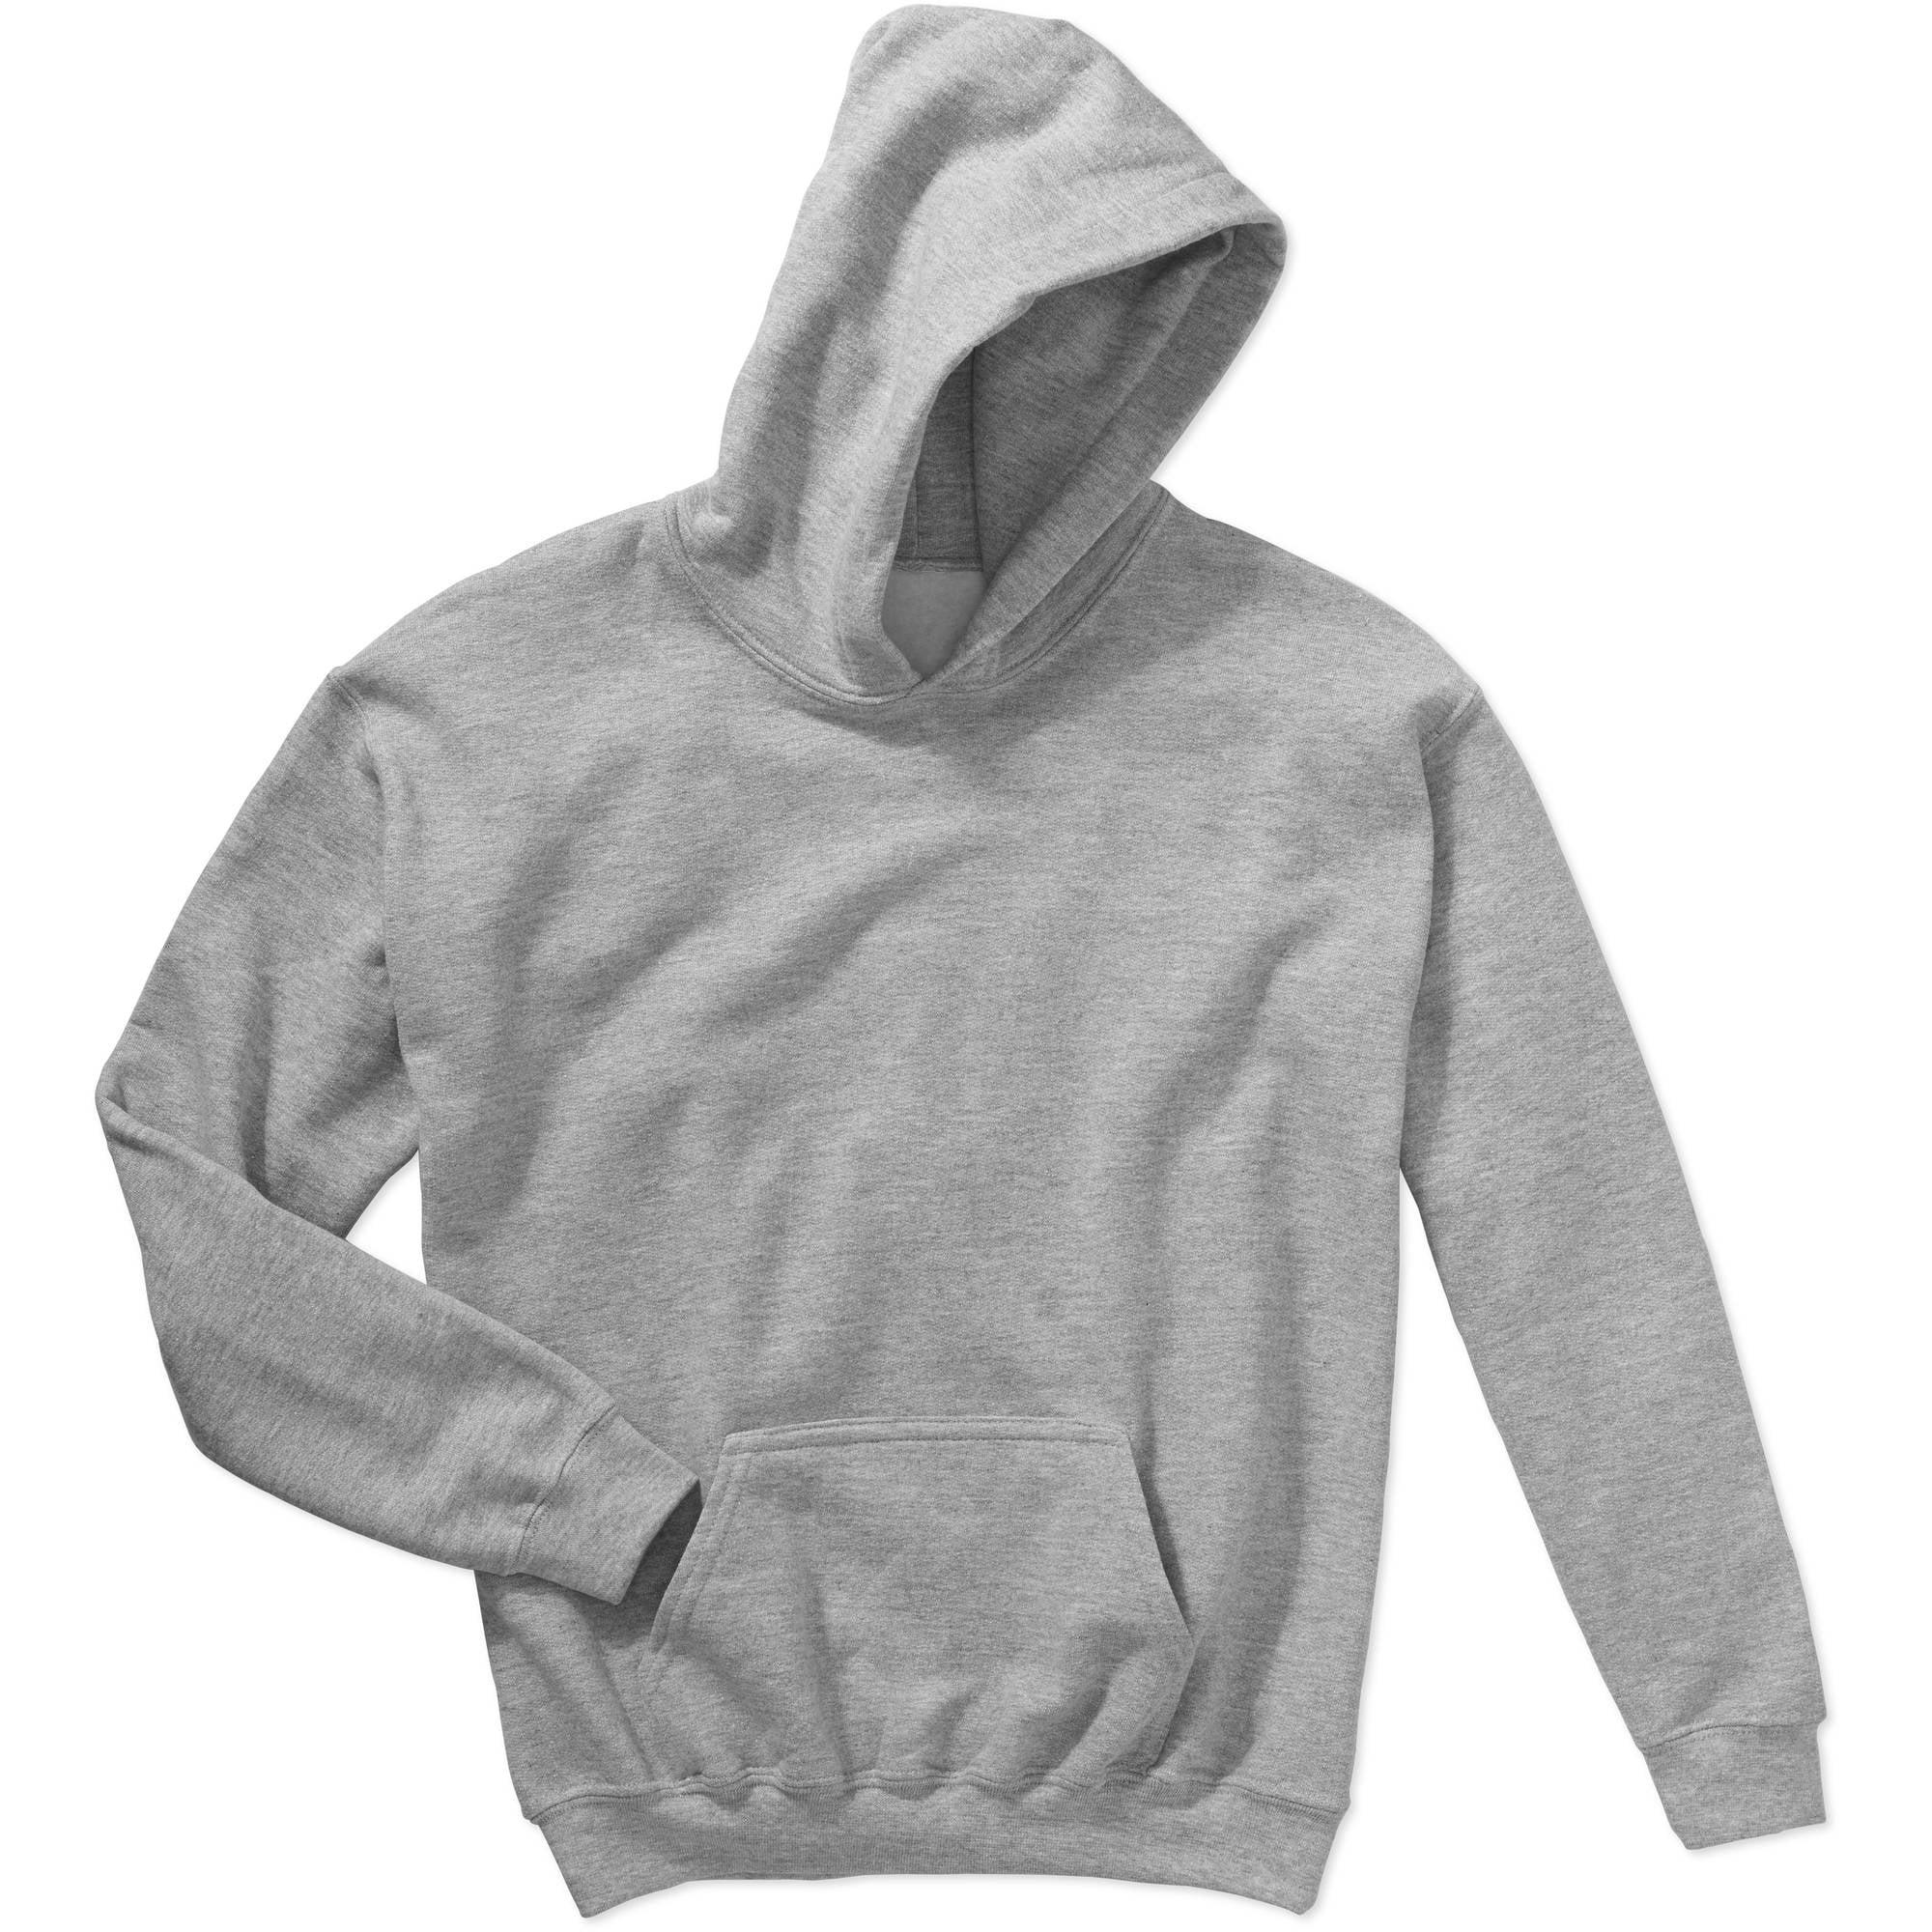 Large GILDAN Kids Big Hooded Youth Sweatshirt White